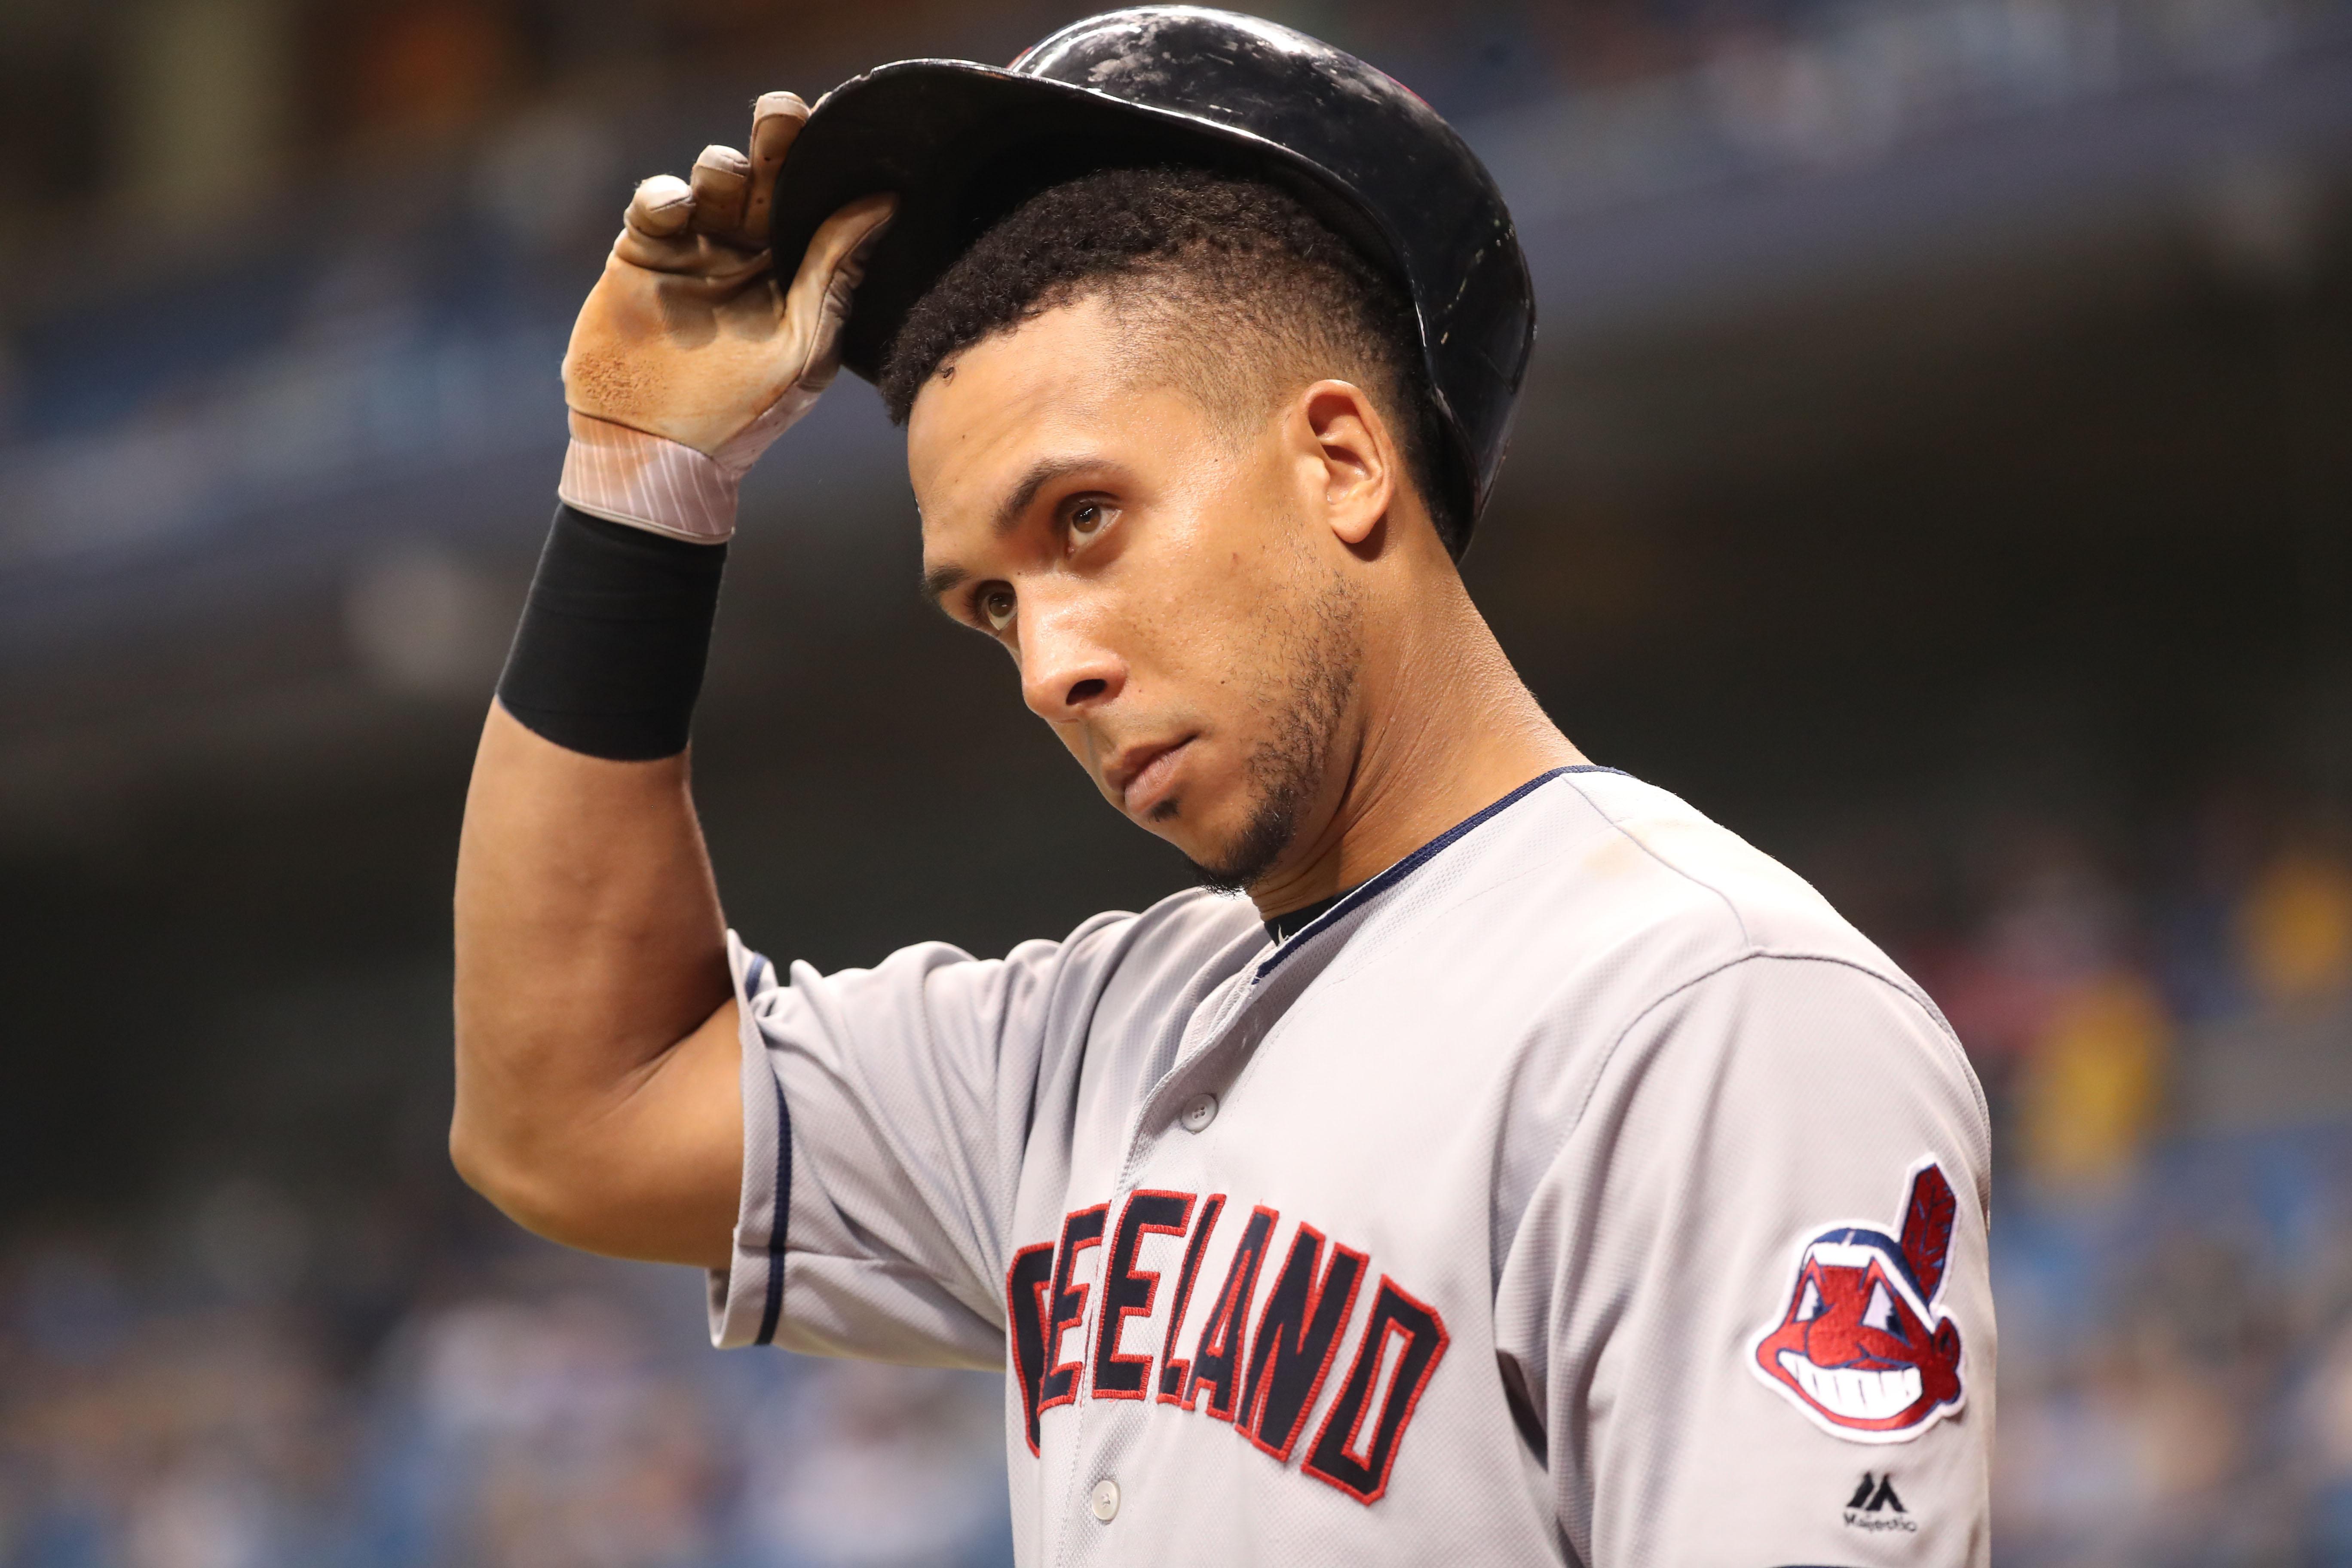 MLB: Cleveland Indians at Tampa Bay Rays